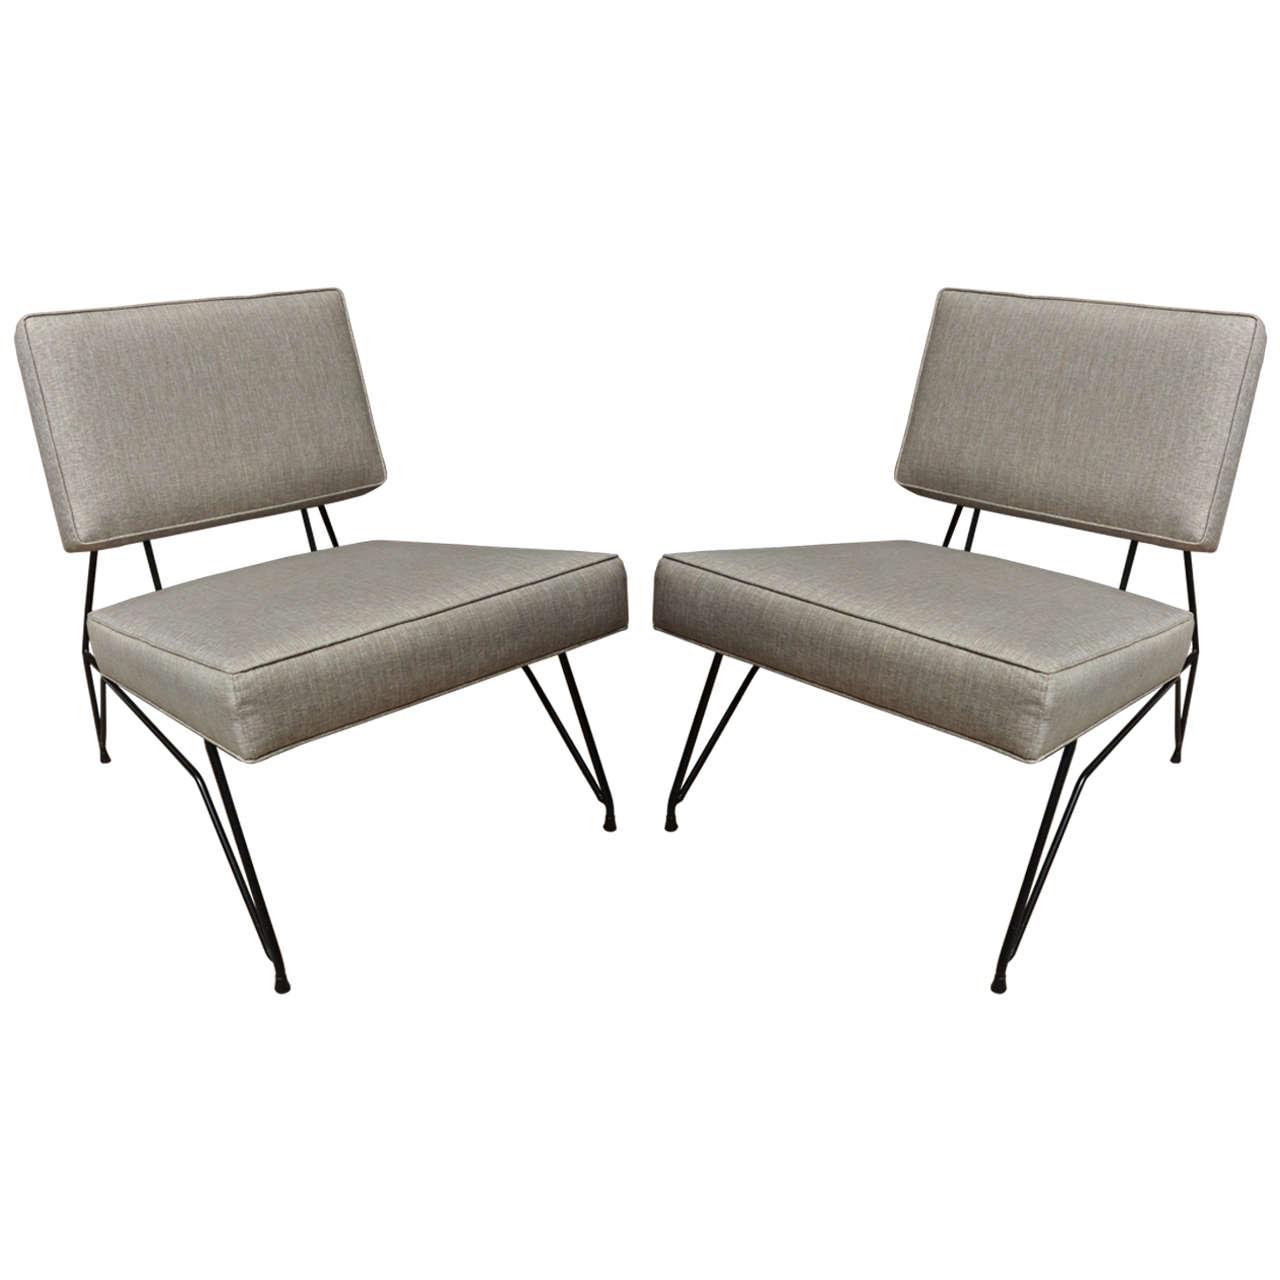 chair design iron lightweight camping pair of italian base upholstered modernist